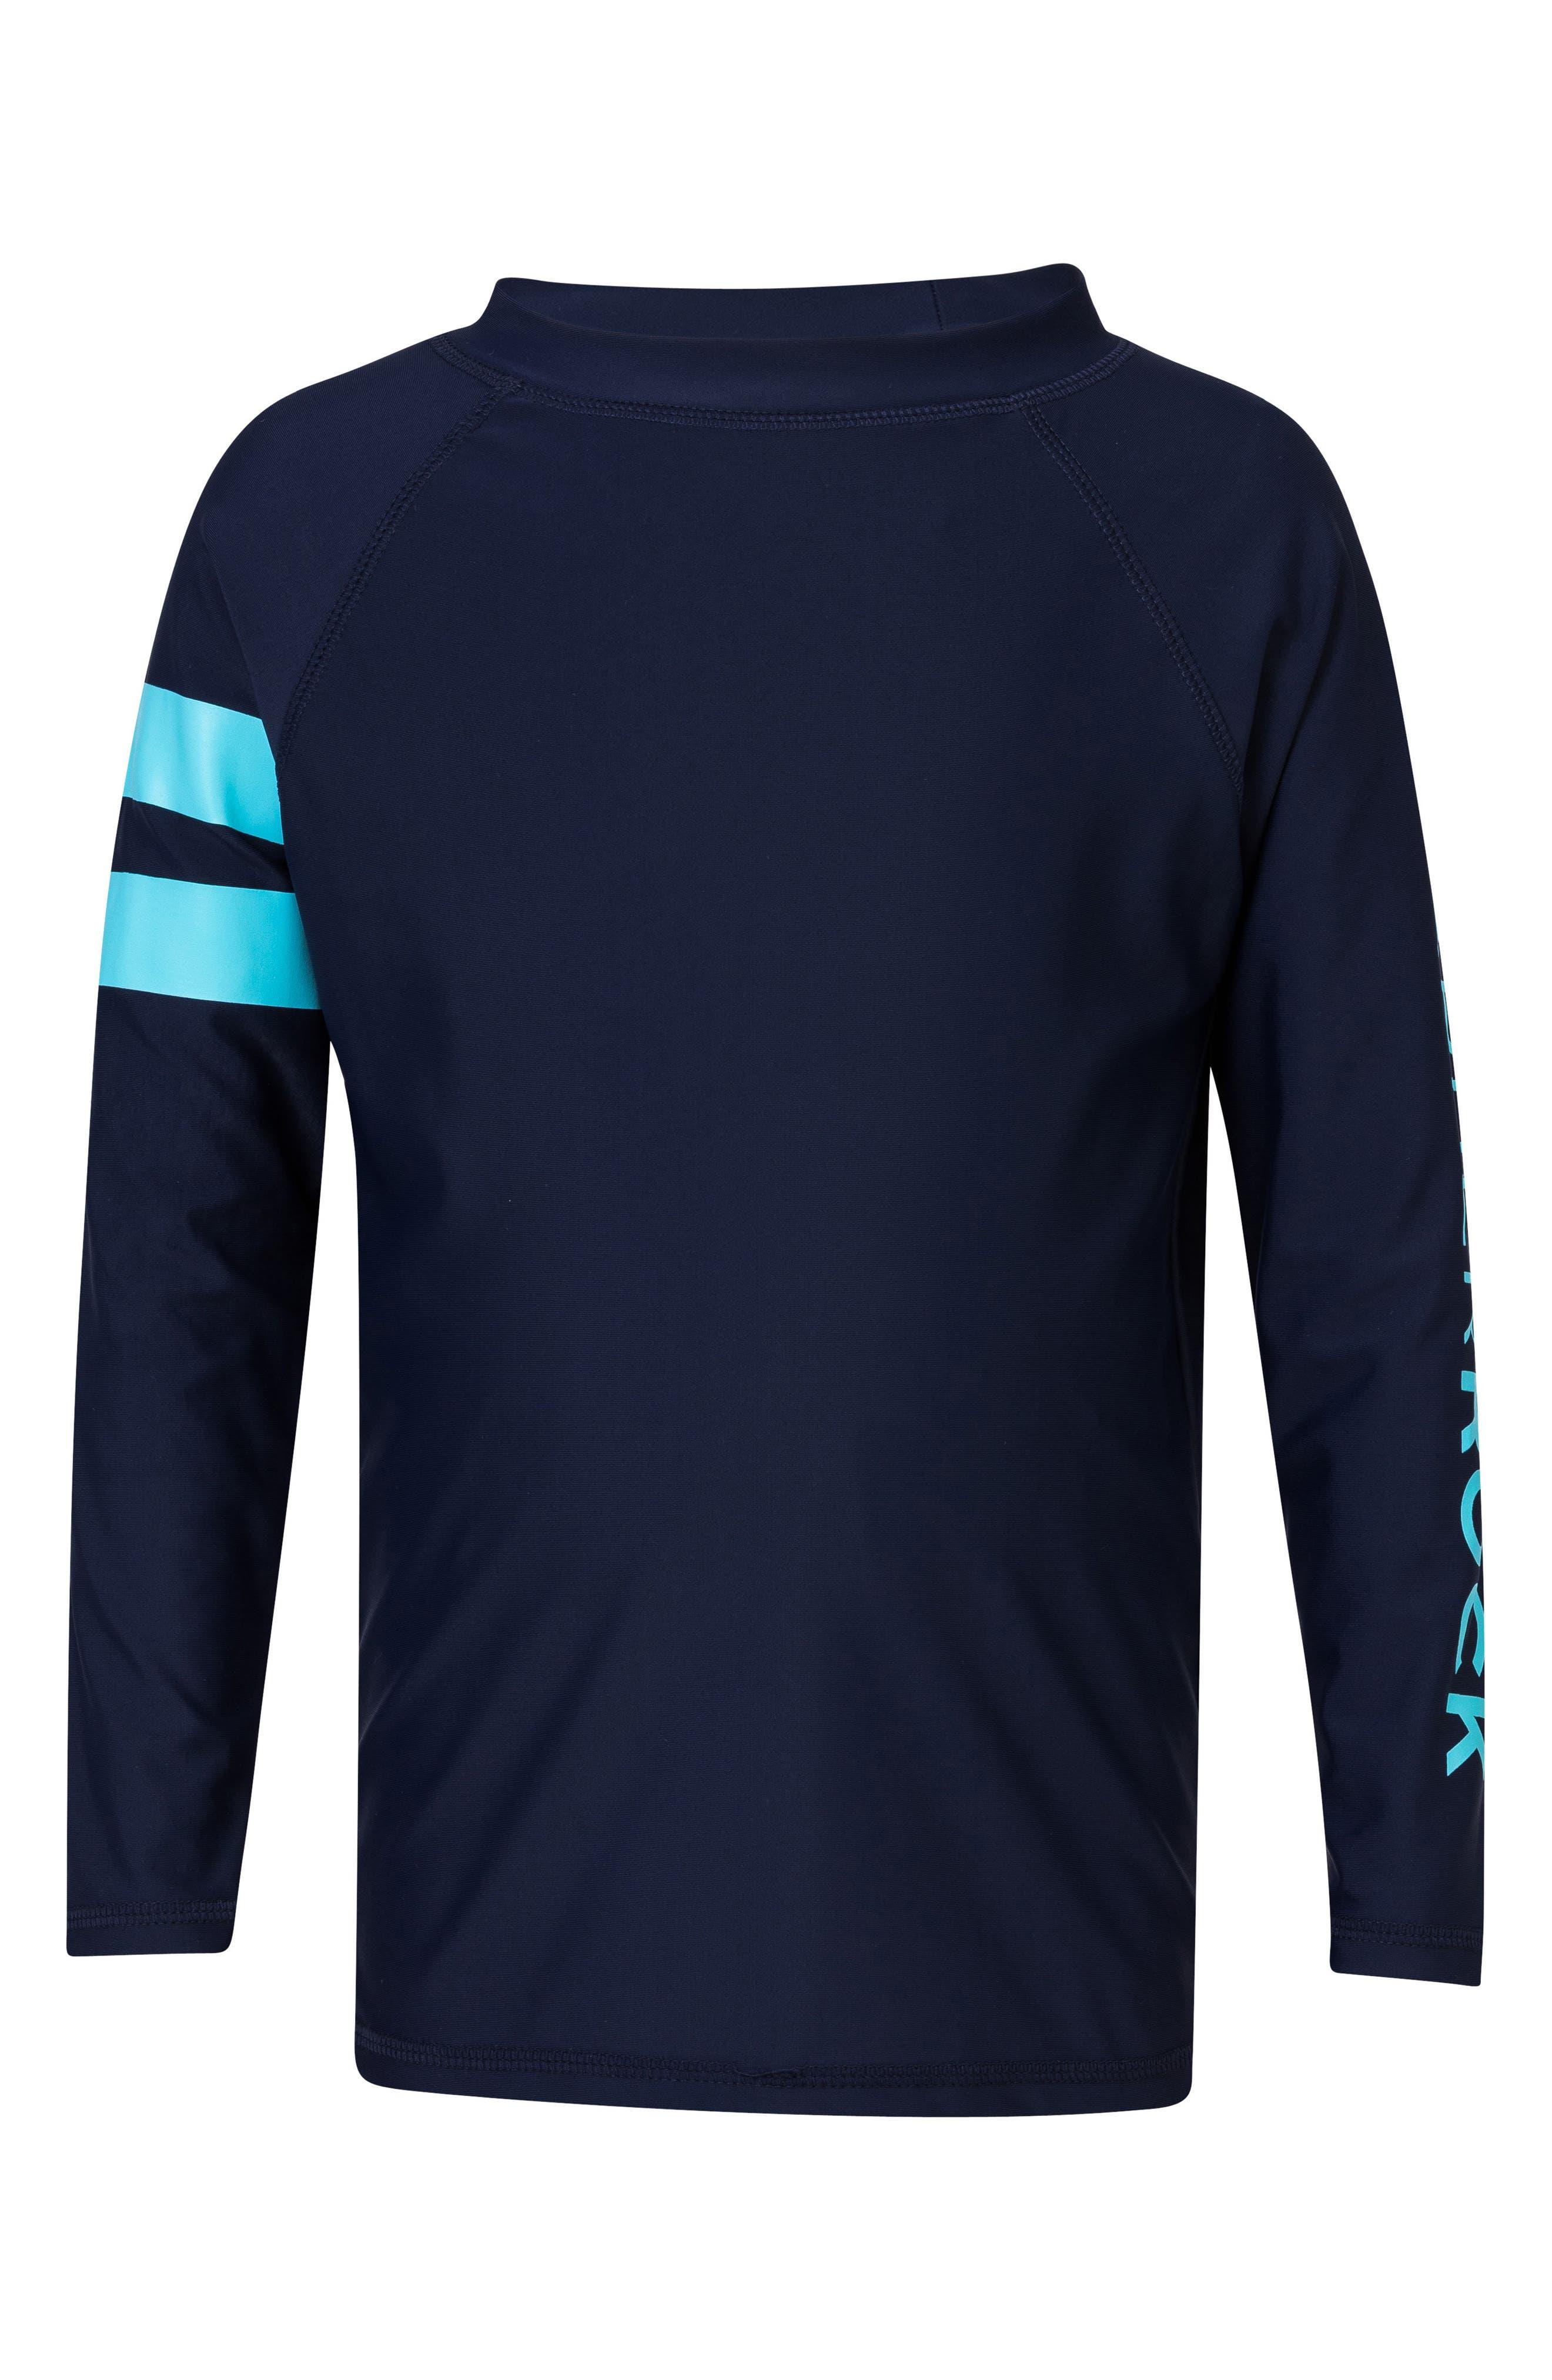 SNAPPER ROCK Raglan Long Sleeve Rashguard, Main, color, NAVY/ LIGHT BLUE STRIPE